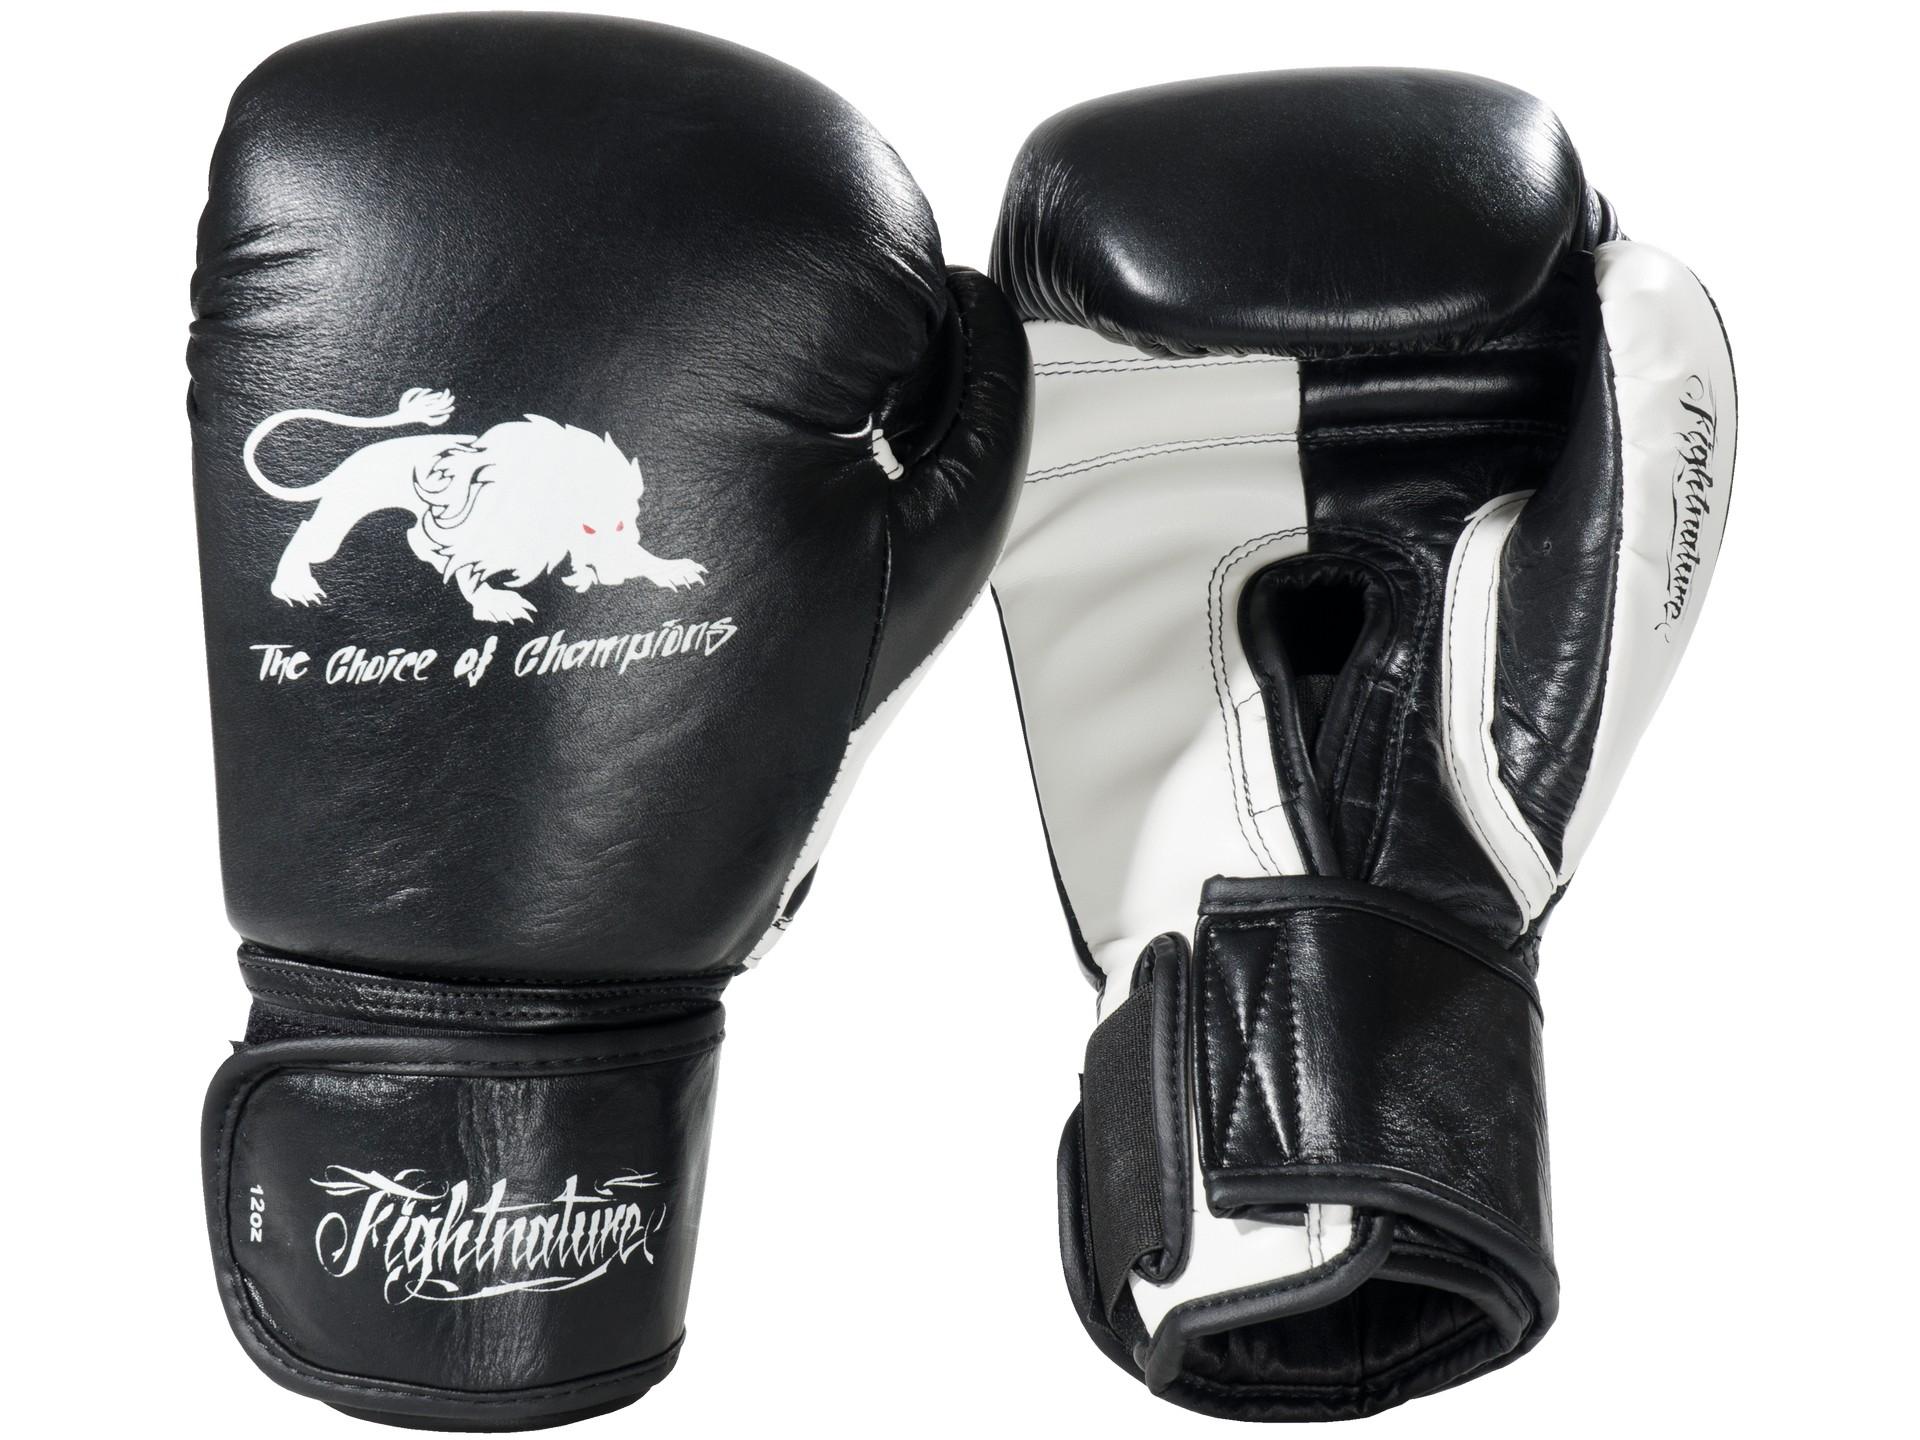 FIGHTNATURE Boxhandschuhe Warrior, 12 + 14 oz.